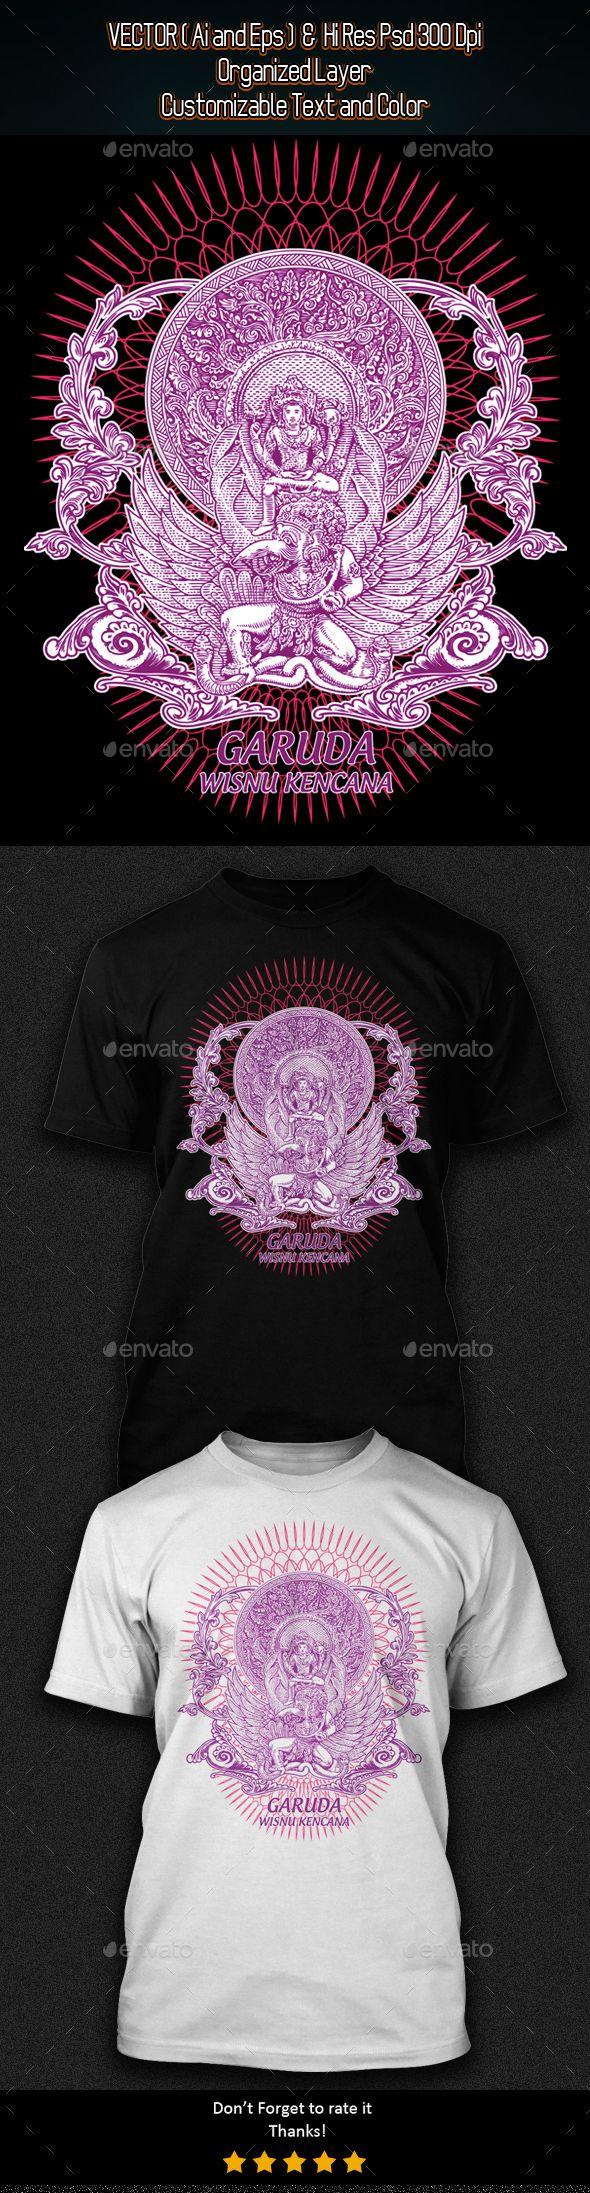 Shirt design illustrator template - Design Garuda Wisnu Kencana T Shirt Illustration Template